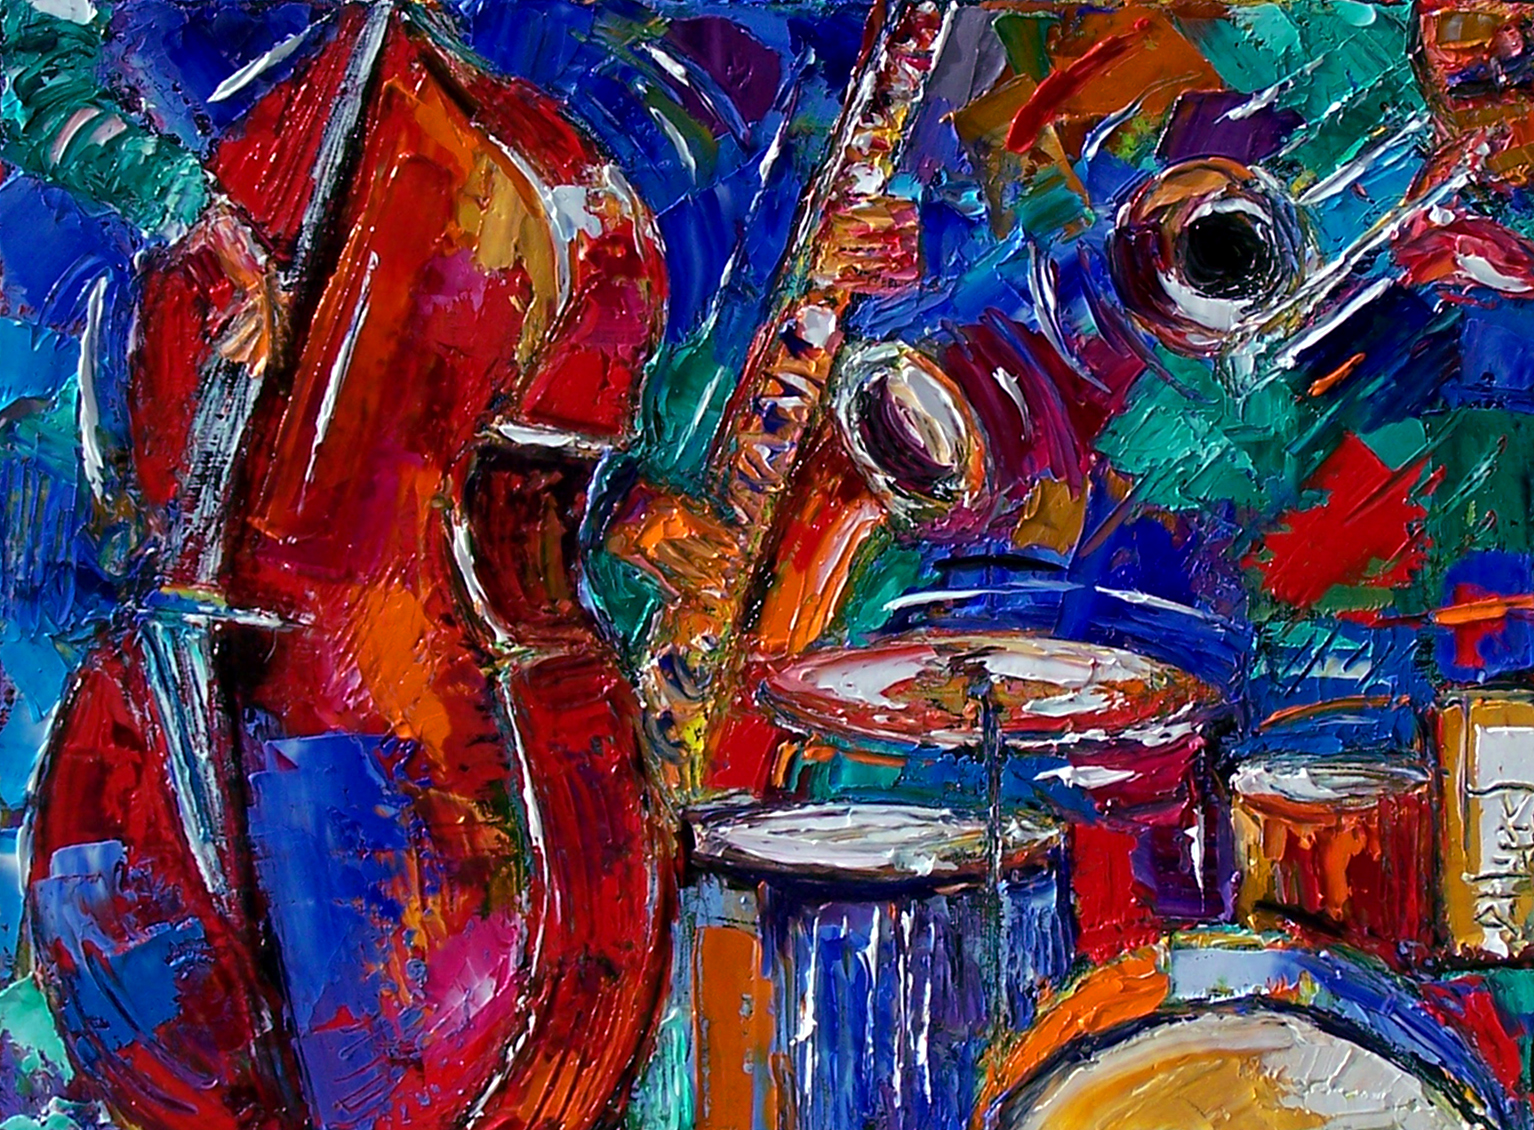 Debra Hurd Original Paintings AND Jazz Art: February 2012